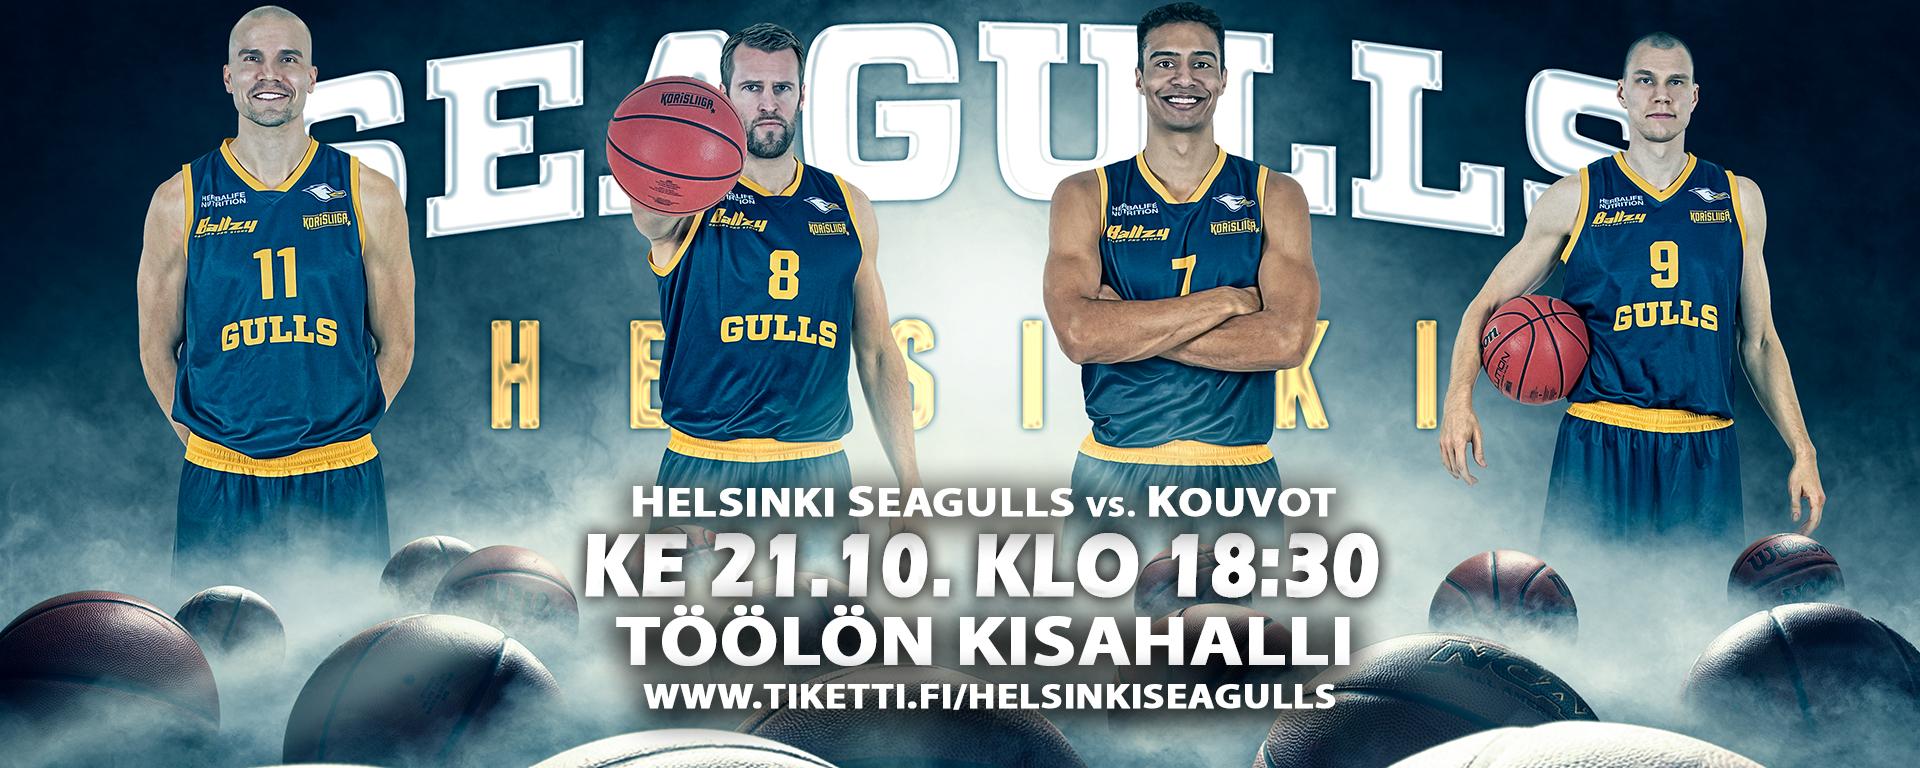 Link to event Helsinki Seagulls vs. Kouvot